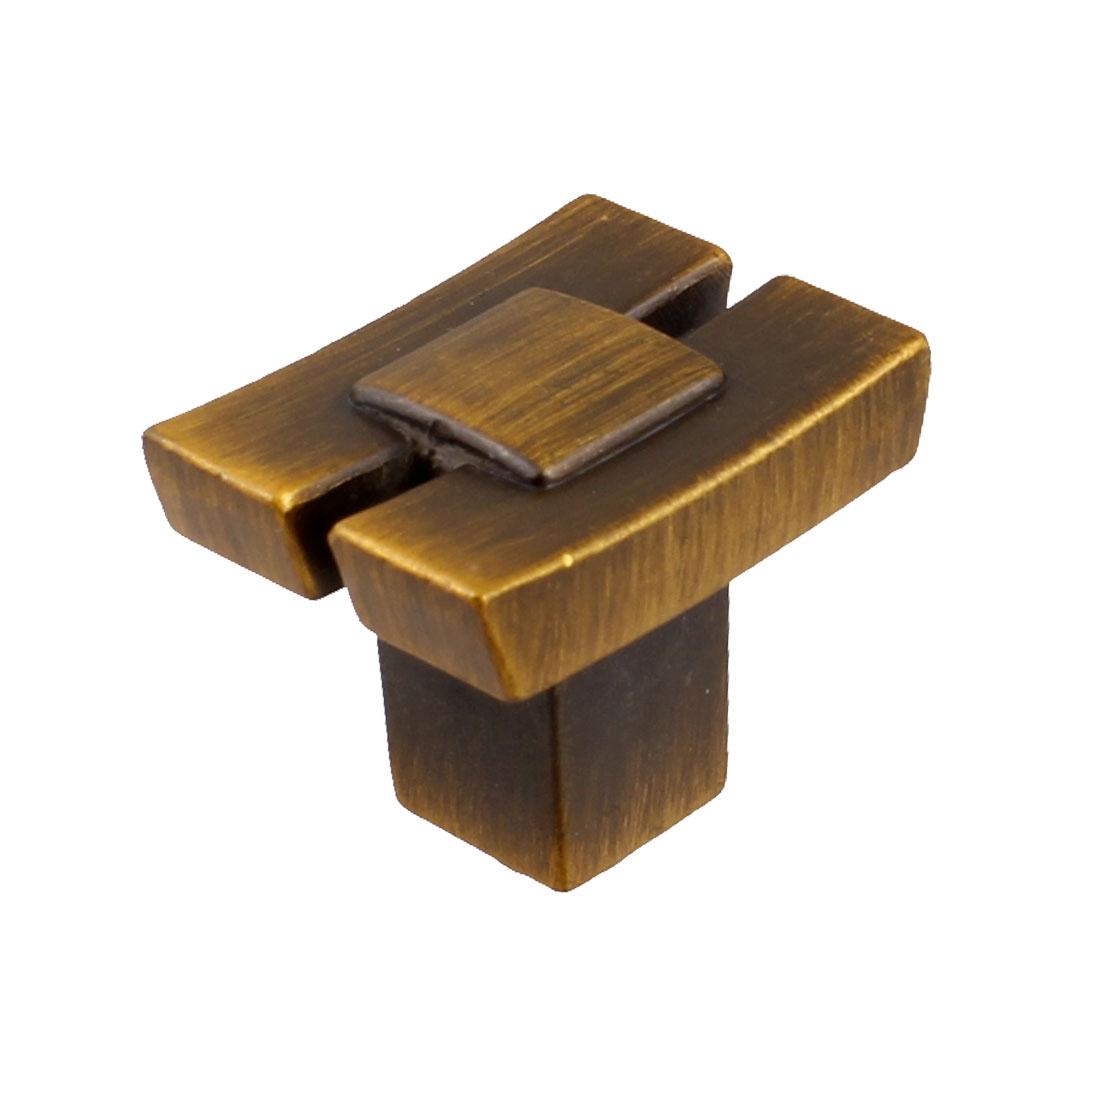 "3.7mm 5/32"" Dia.Screw Hole Retro Style Metal Cabinet Door Pull Handle Knob"